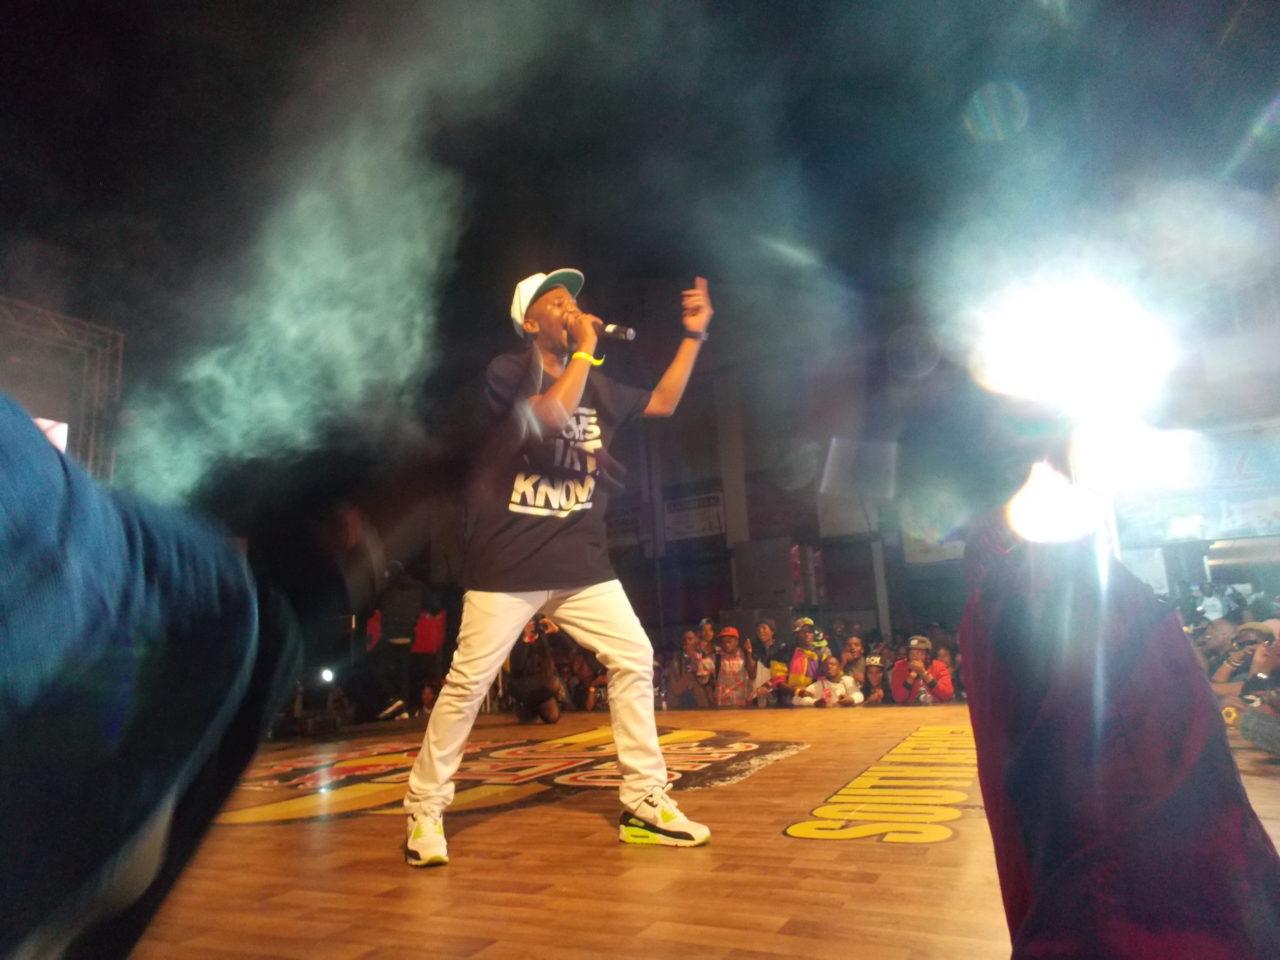 Okamalumekoolkat performing on the Redbull stage at Back To The City. Photo by Bonginkosi Ntiwane